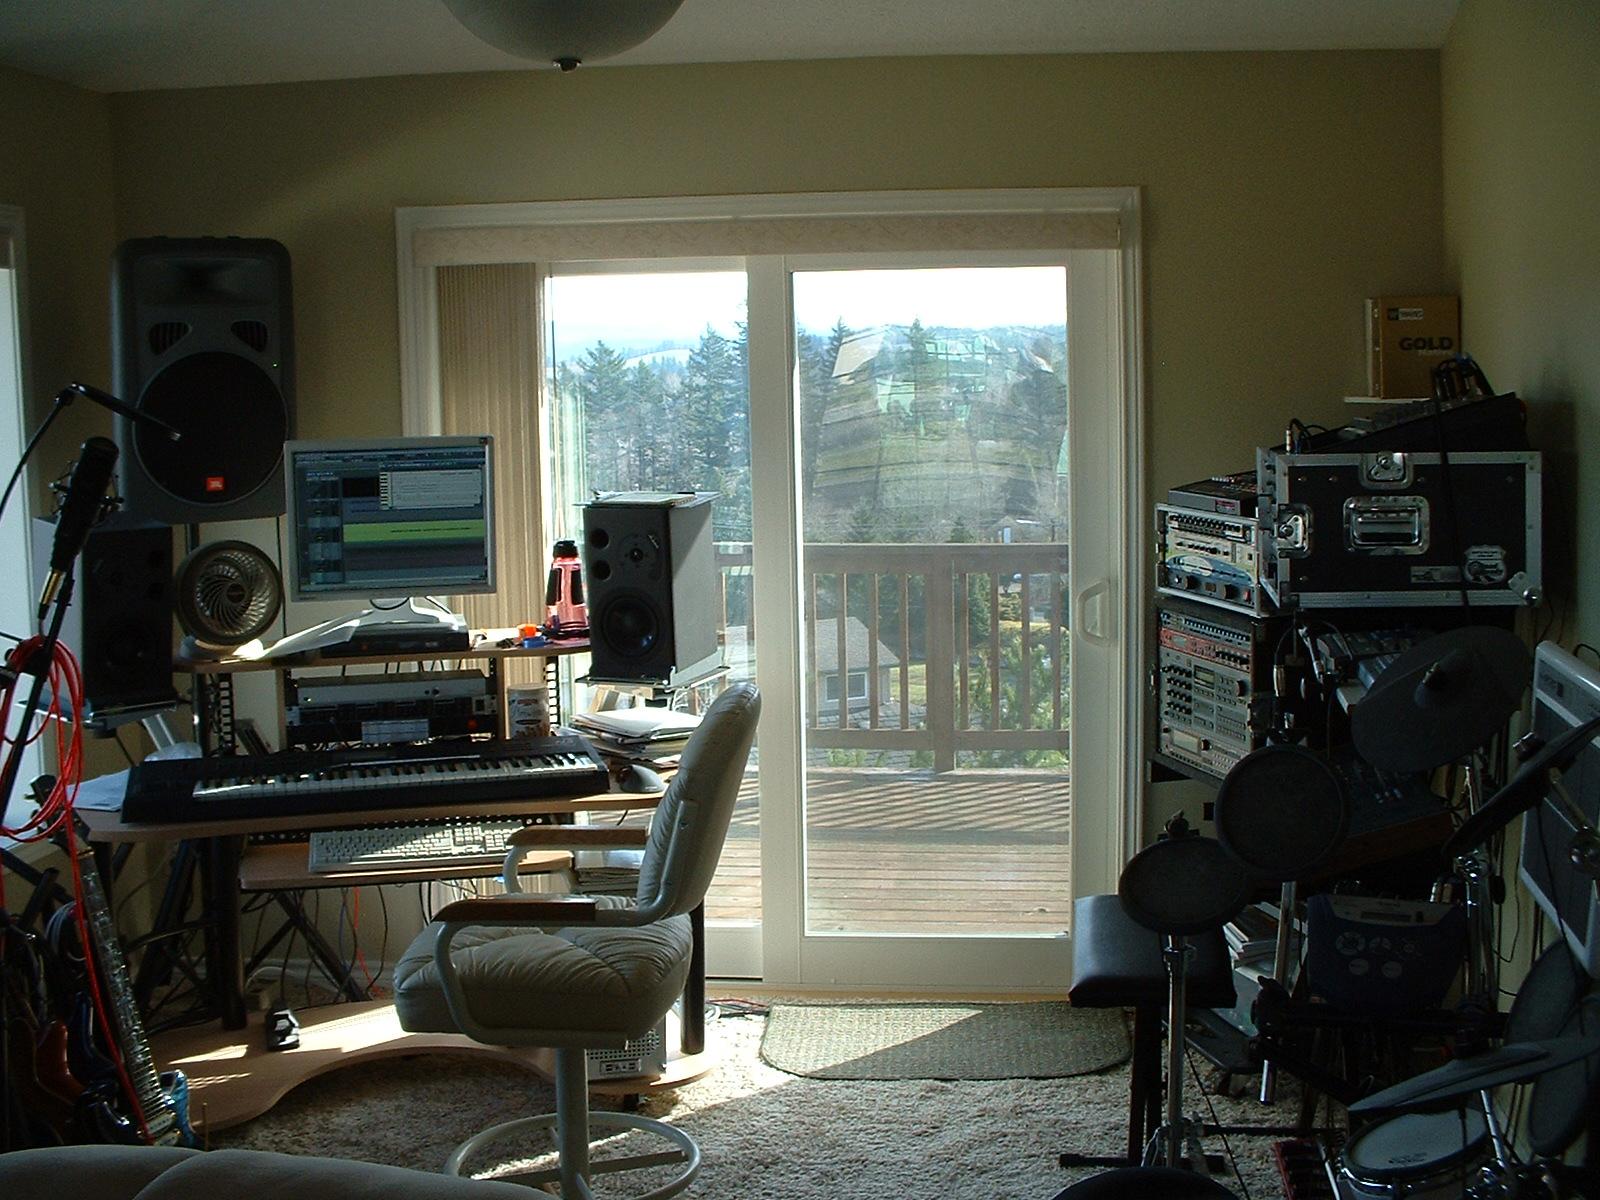 01-Studio2010-14.jpg